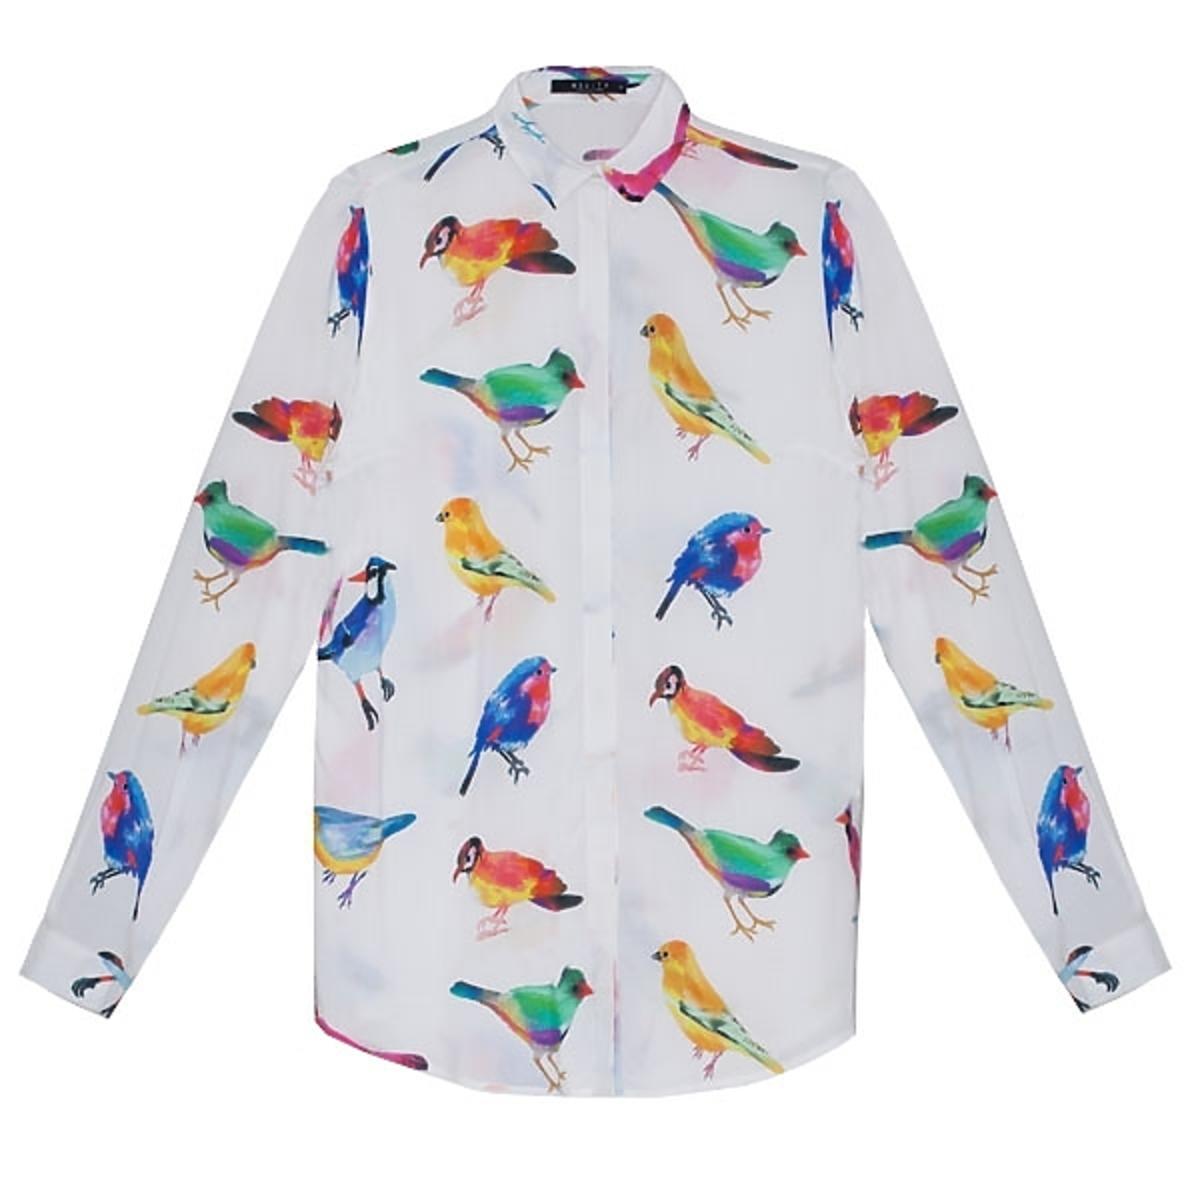 Wzorzysta koszula Mohito, cena